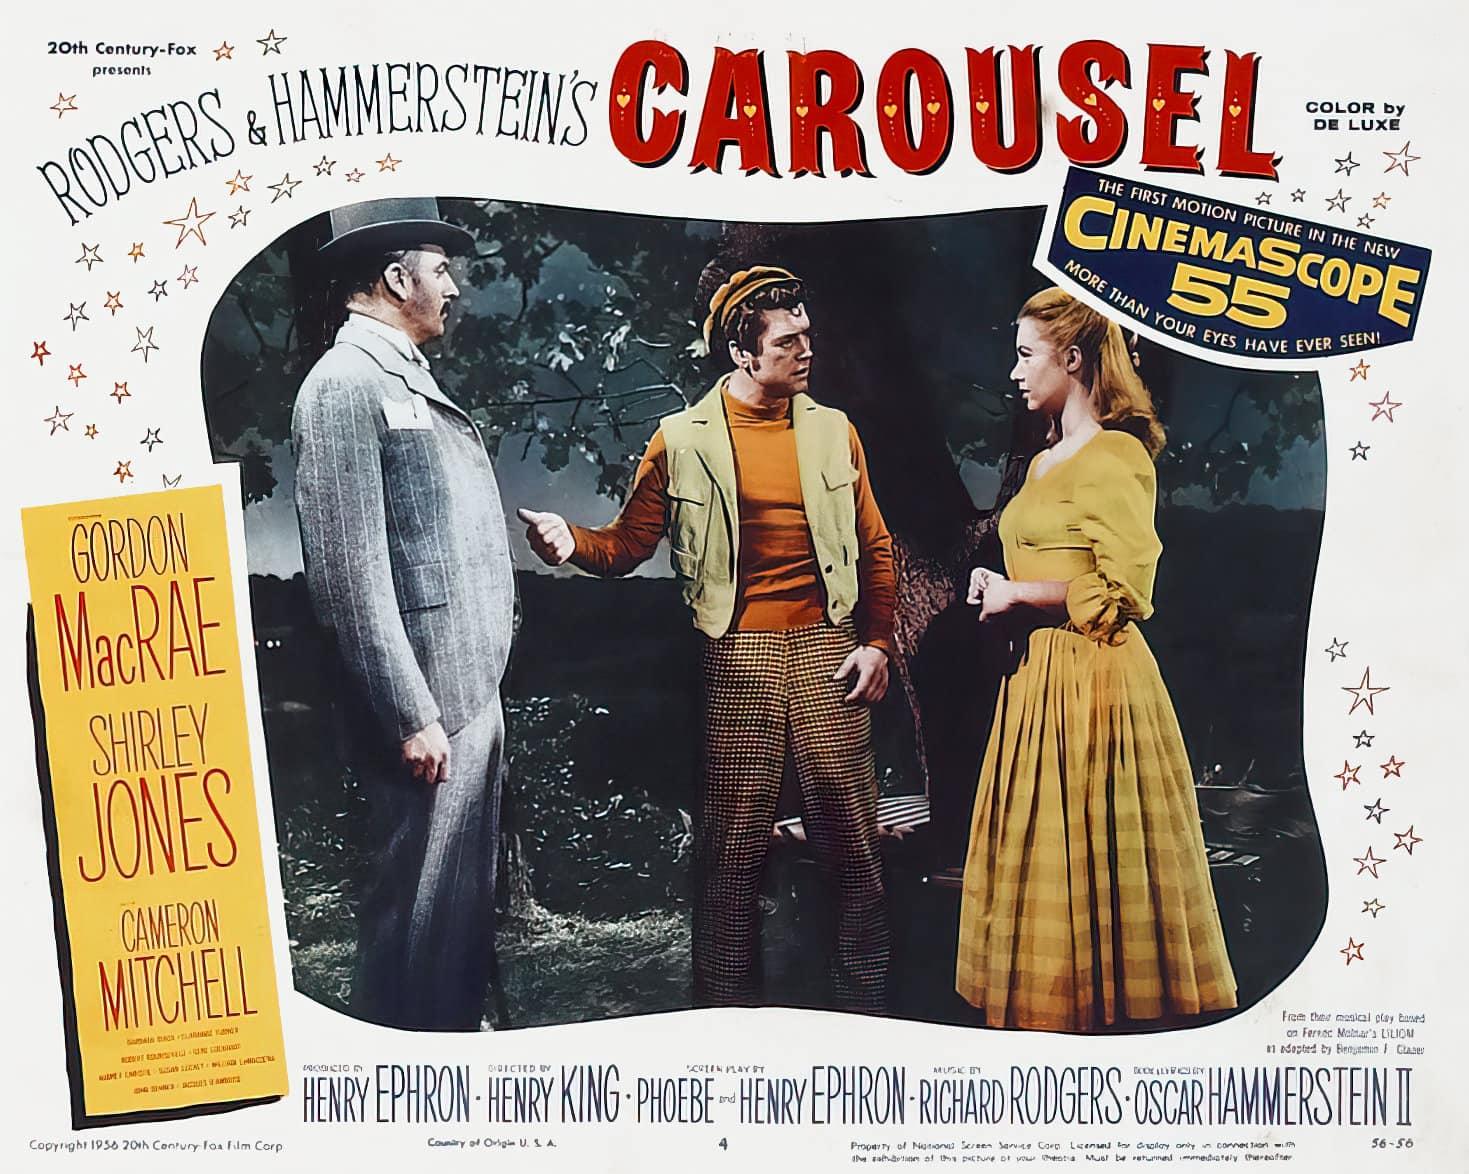 Vintage Carousel movie lobby card - 1950s (1)